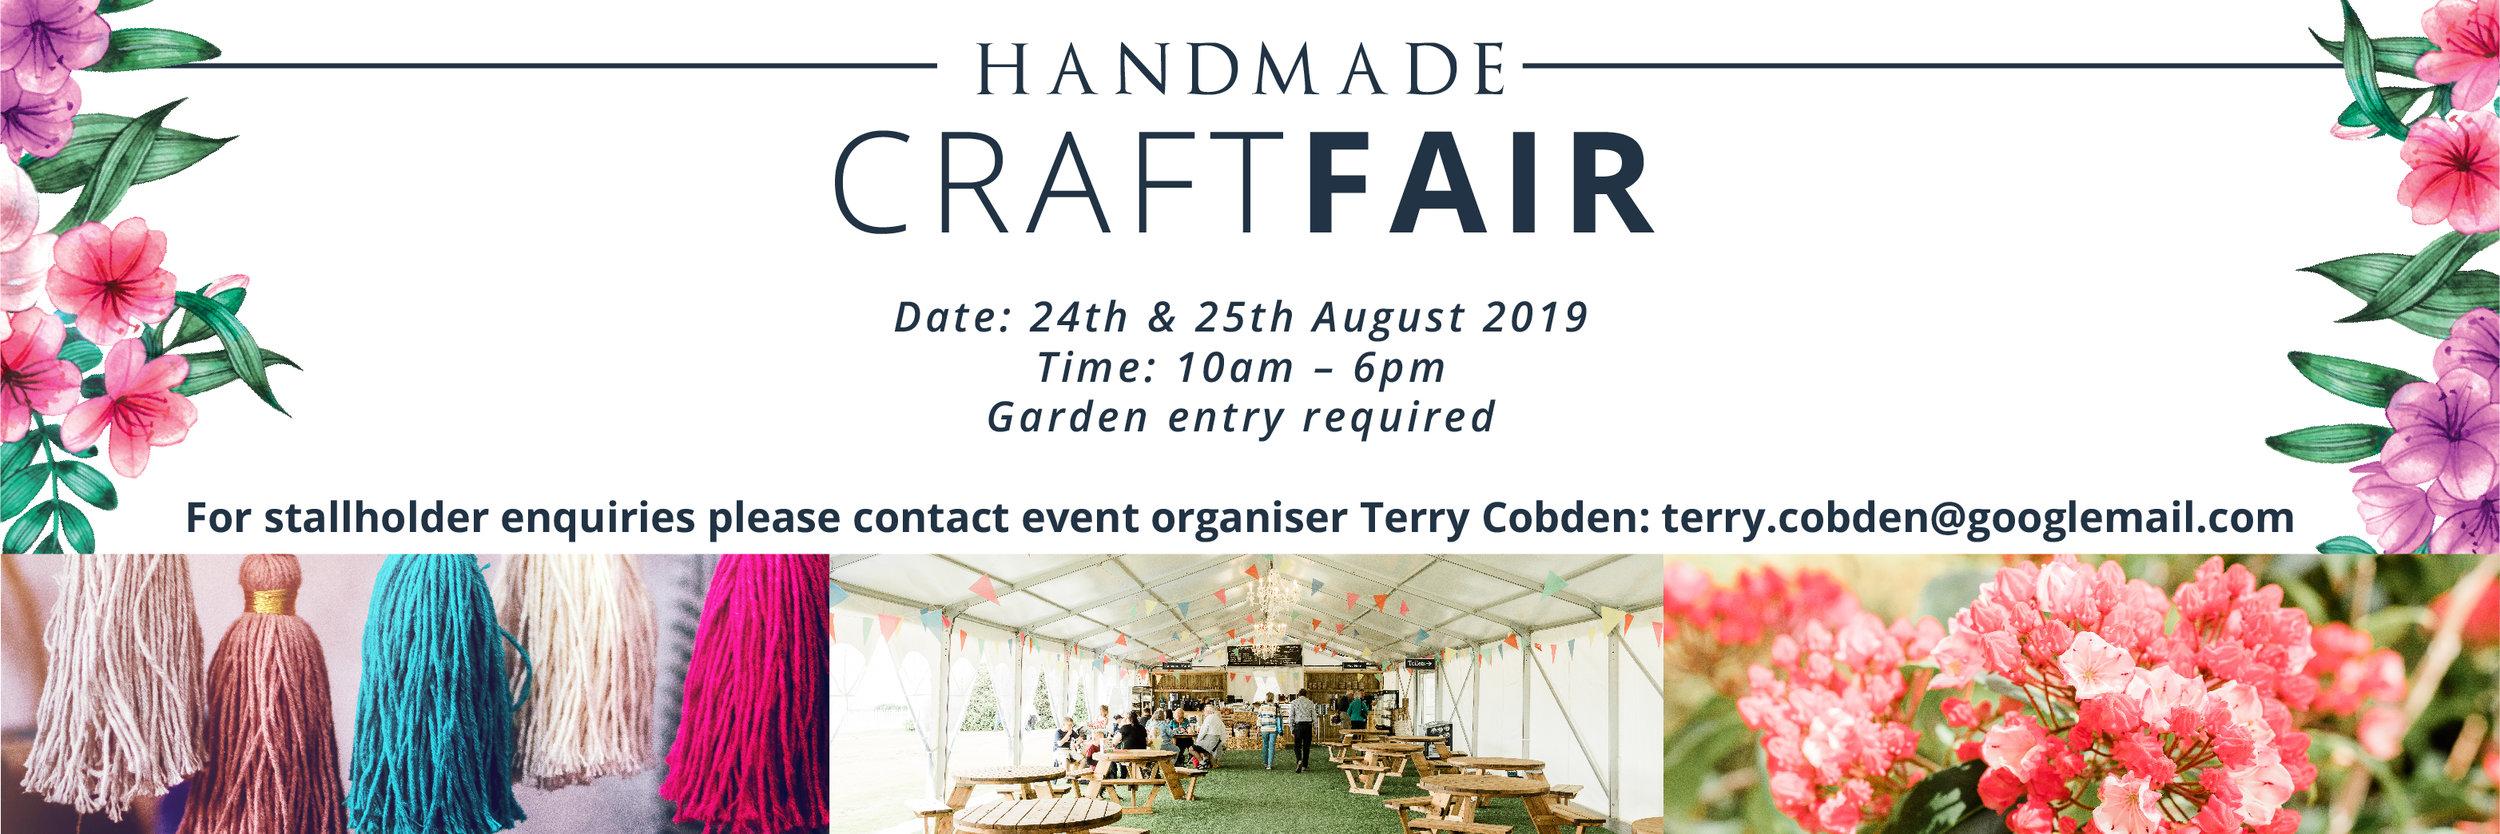 Handmade craft fair web banner.jpg